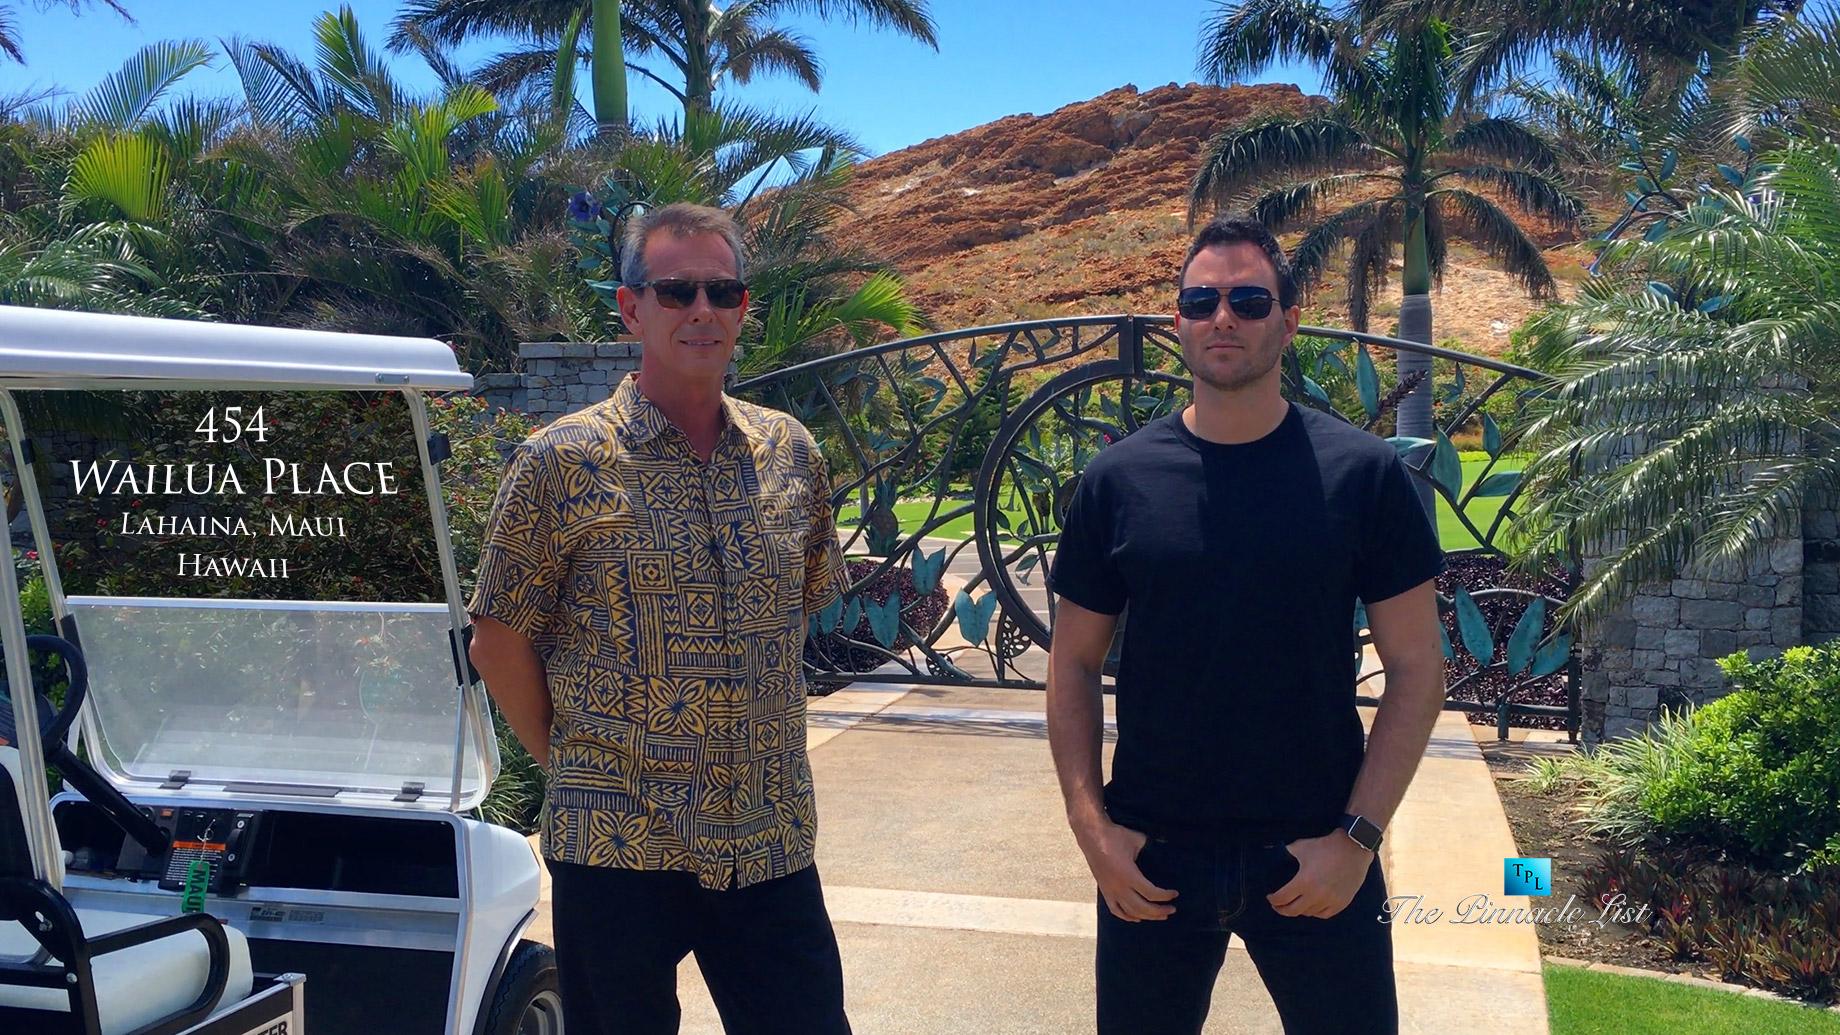 Maui Trophy Property - 454 Wailau Pl, Lahaina, HI, USA - Marcus Anthony & Dean Otto - Luxury Real Estate